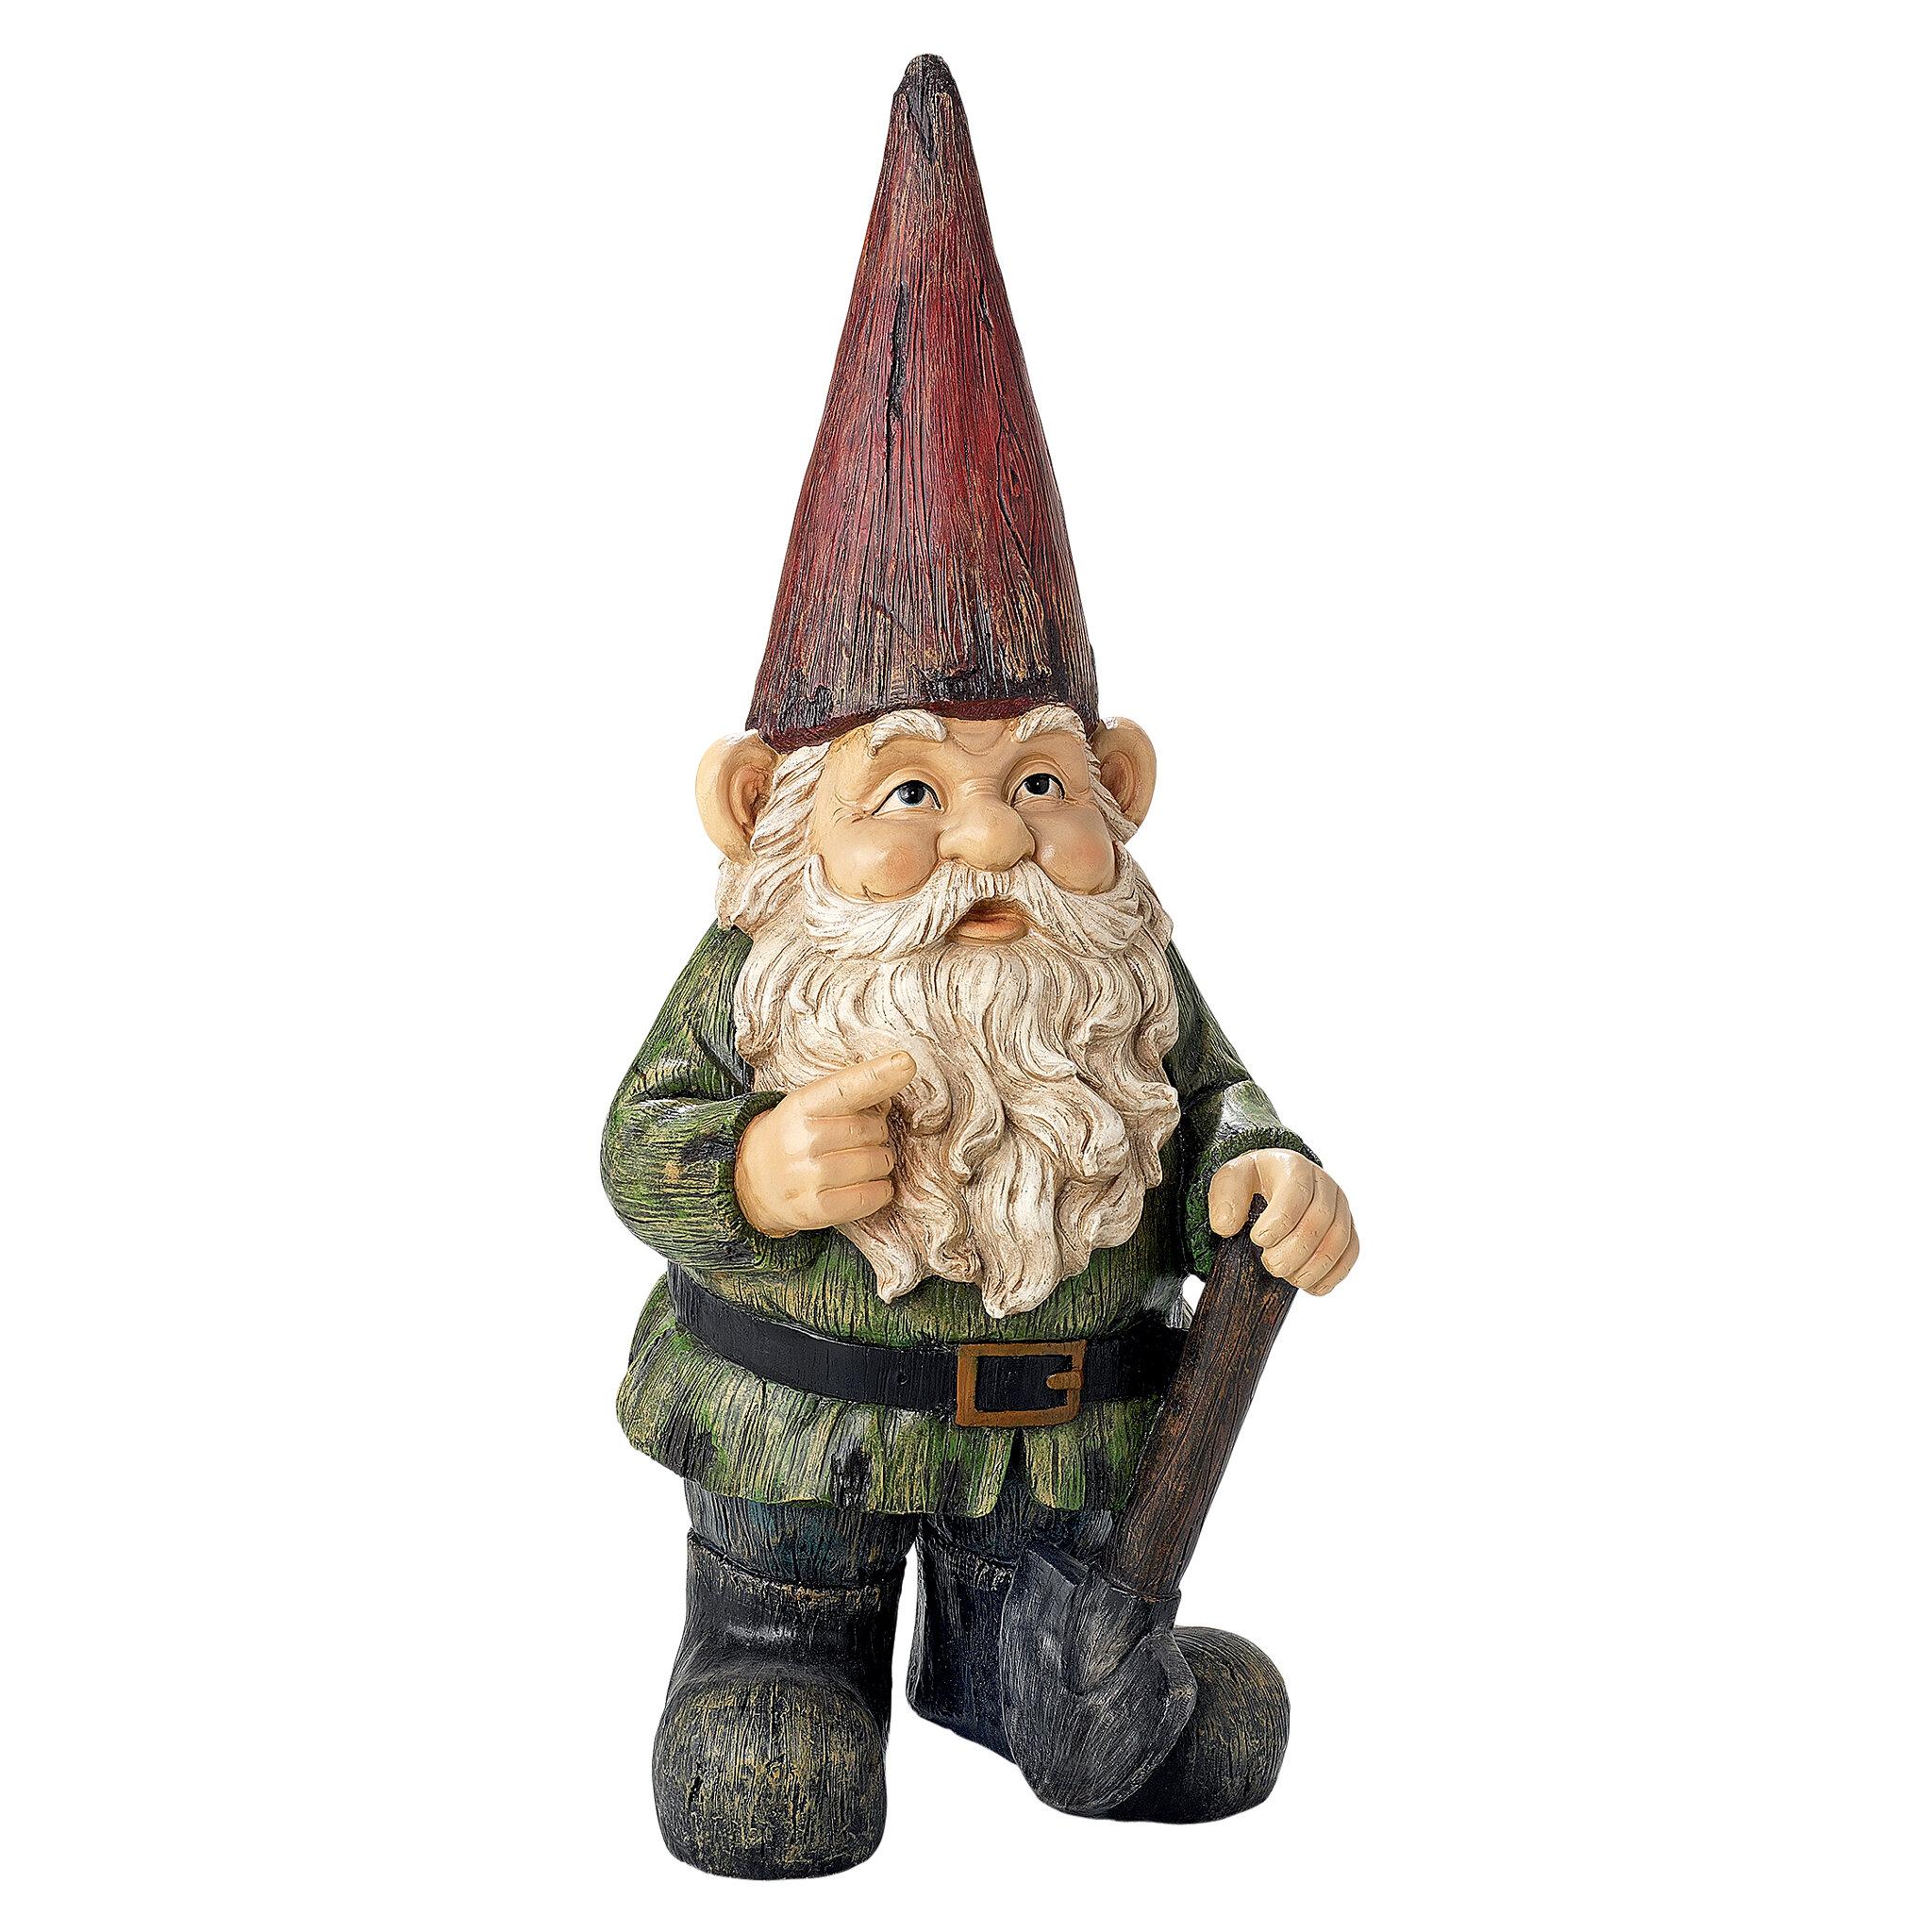 Genial Design Toscano Gottfried, The Gigantic Garden Gnome Statue U0026 Reviews |  Wayfair